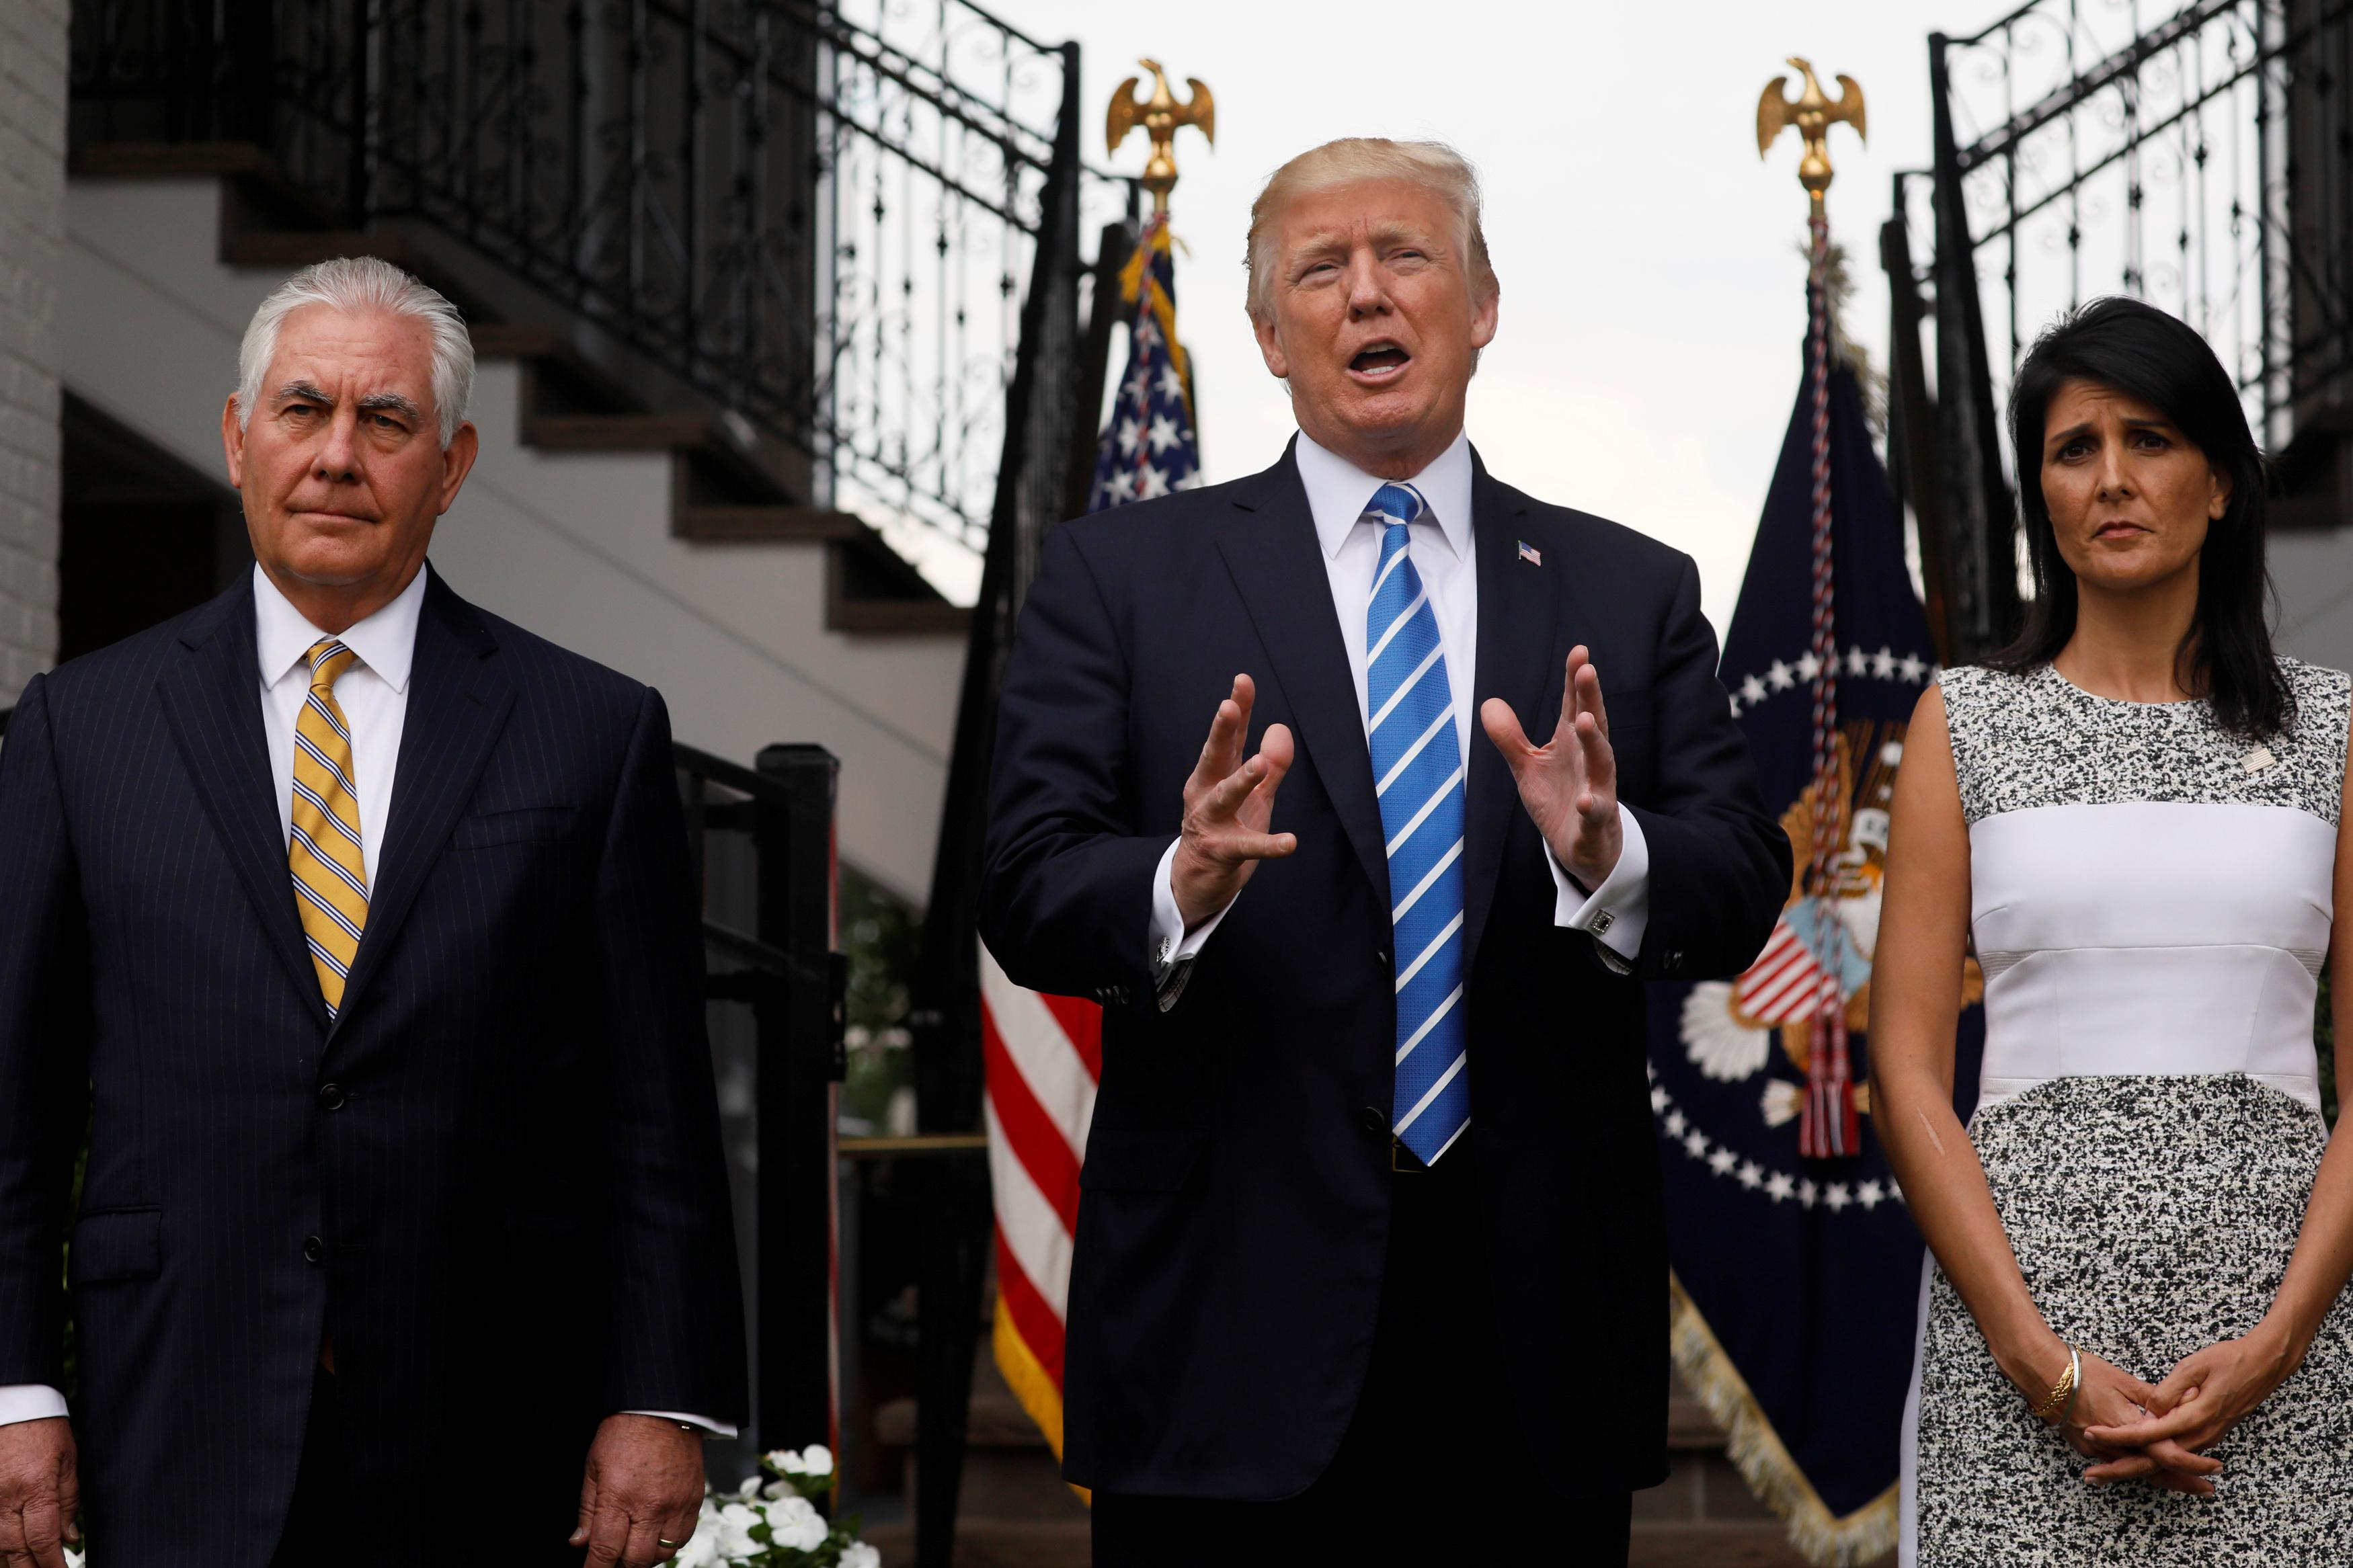 Amid Trump backlash, his U.N. envoy says stand up, isolate hate